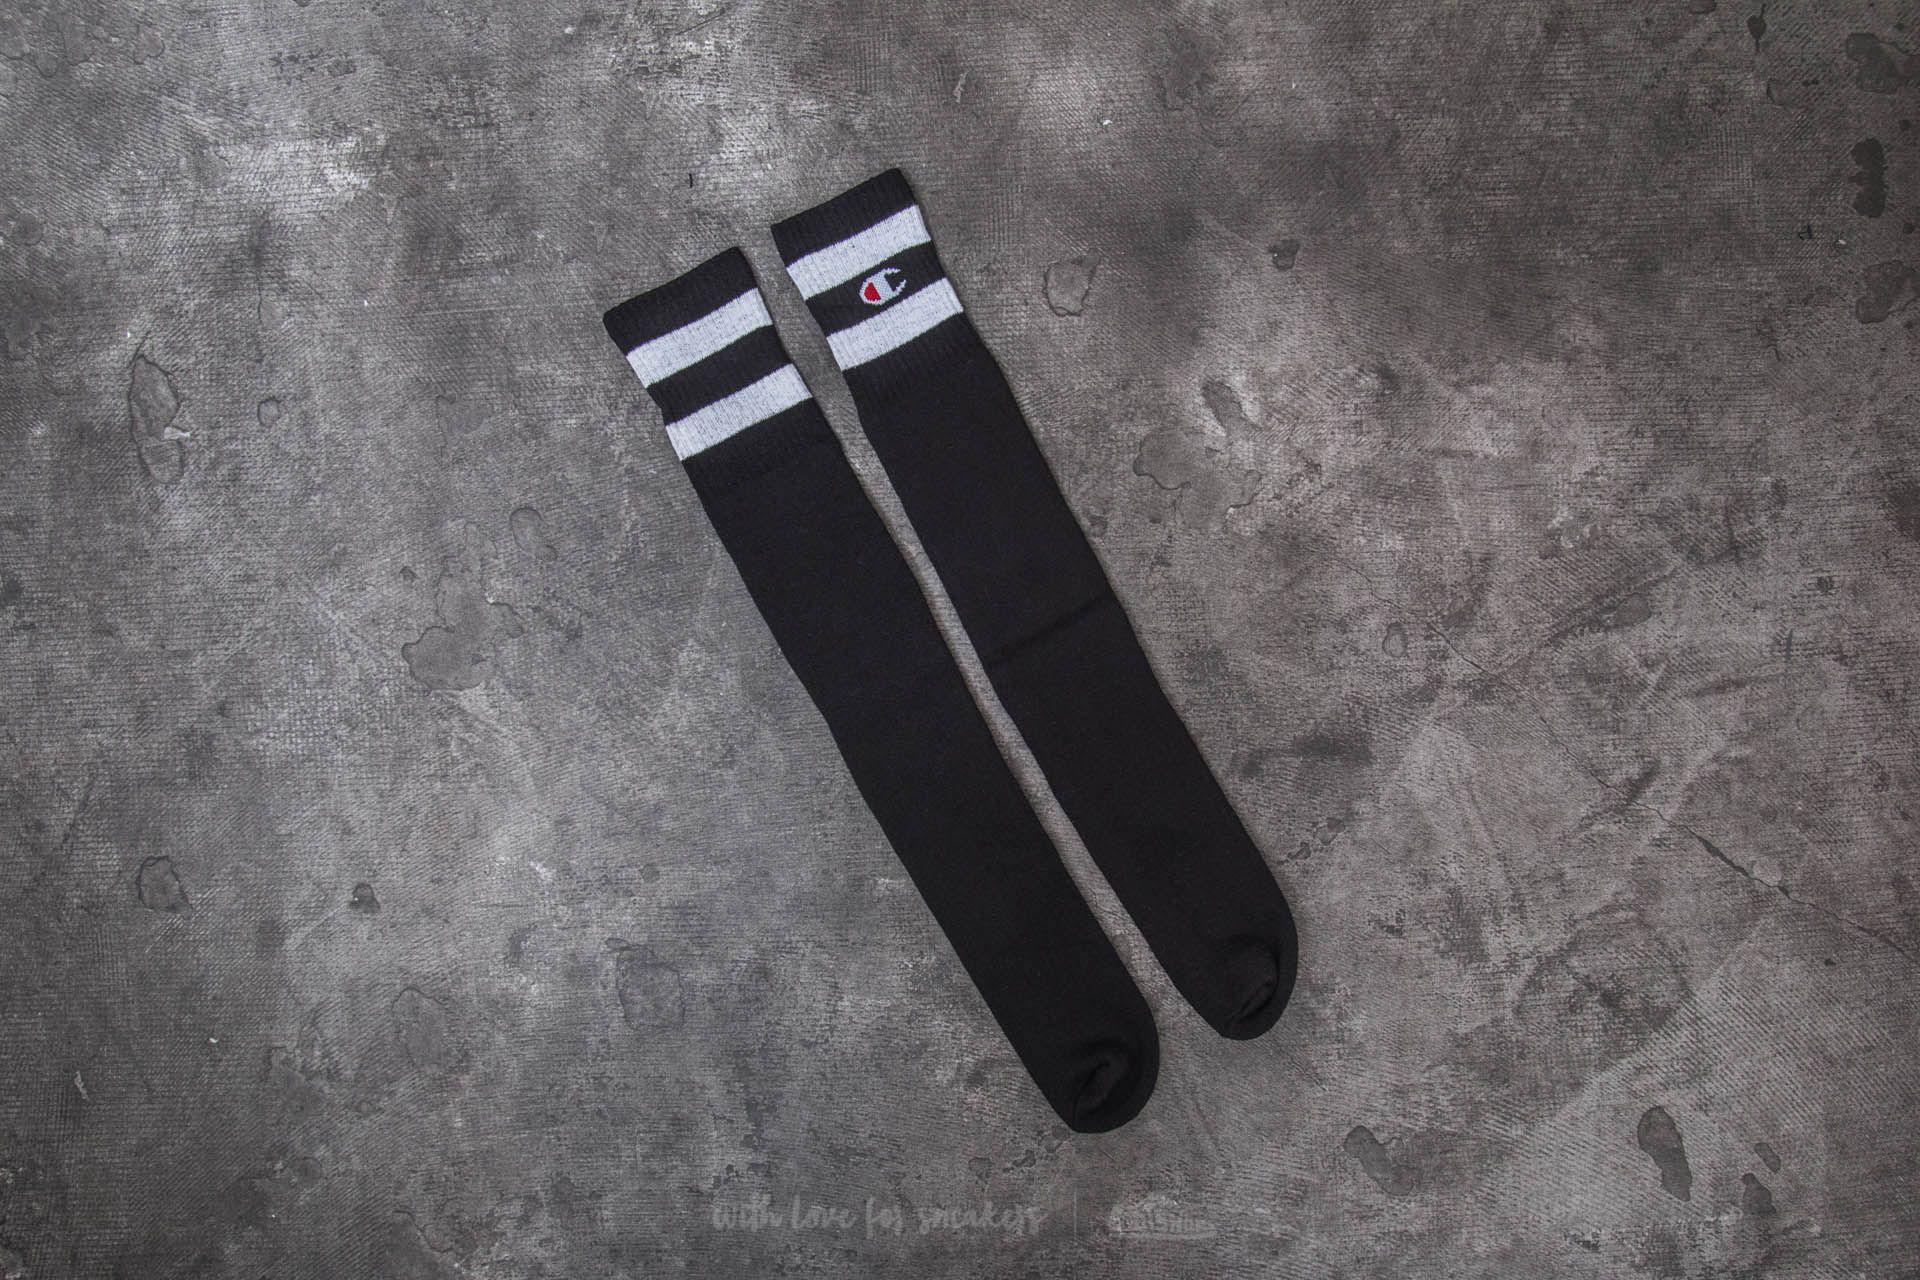 Champion 1 Pair Knee High Socks Black - 20339